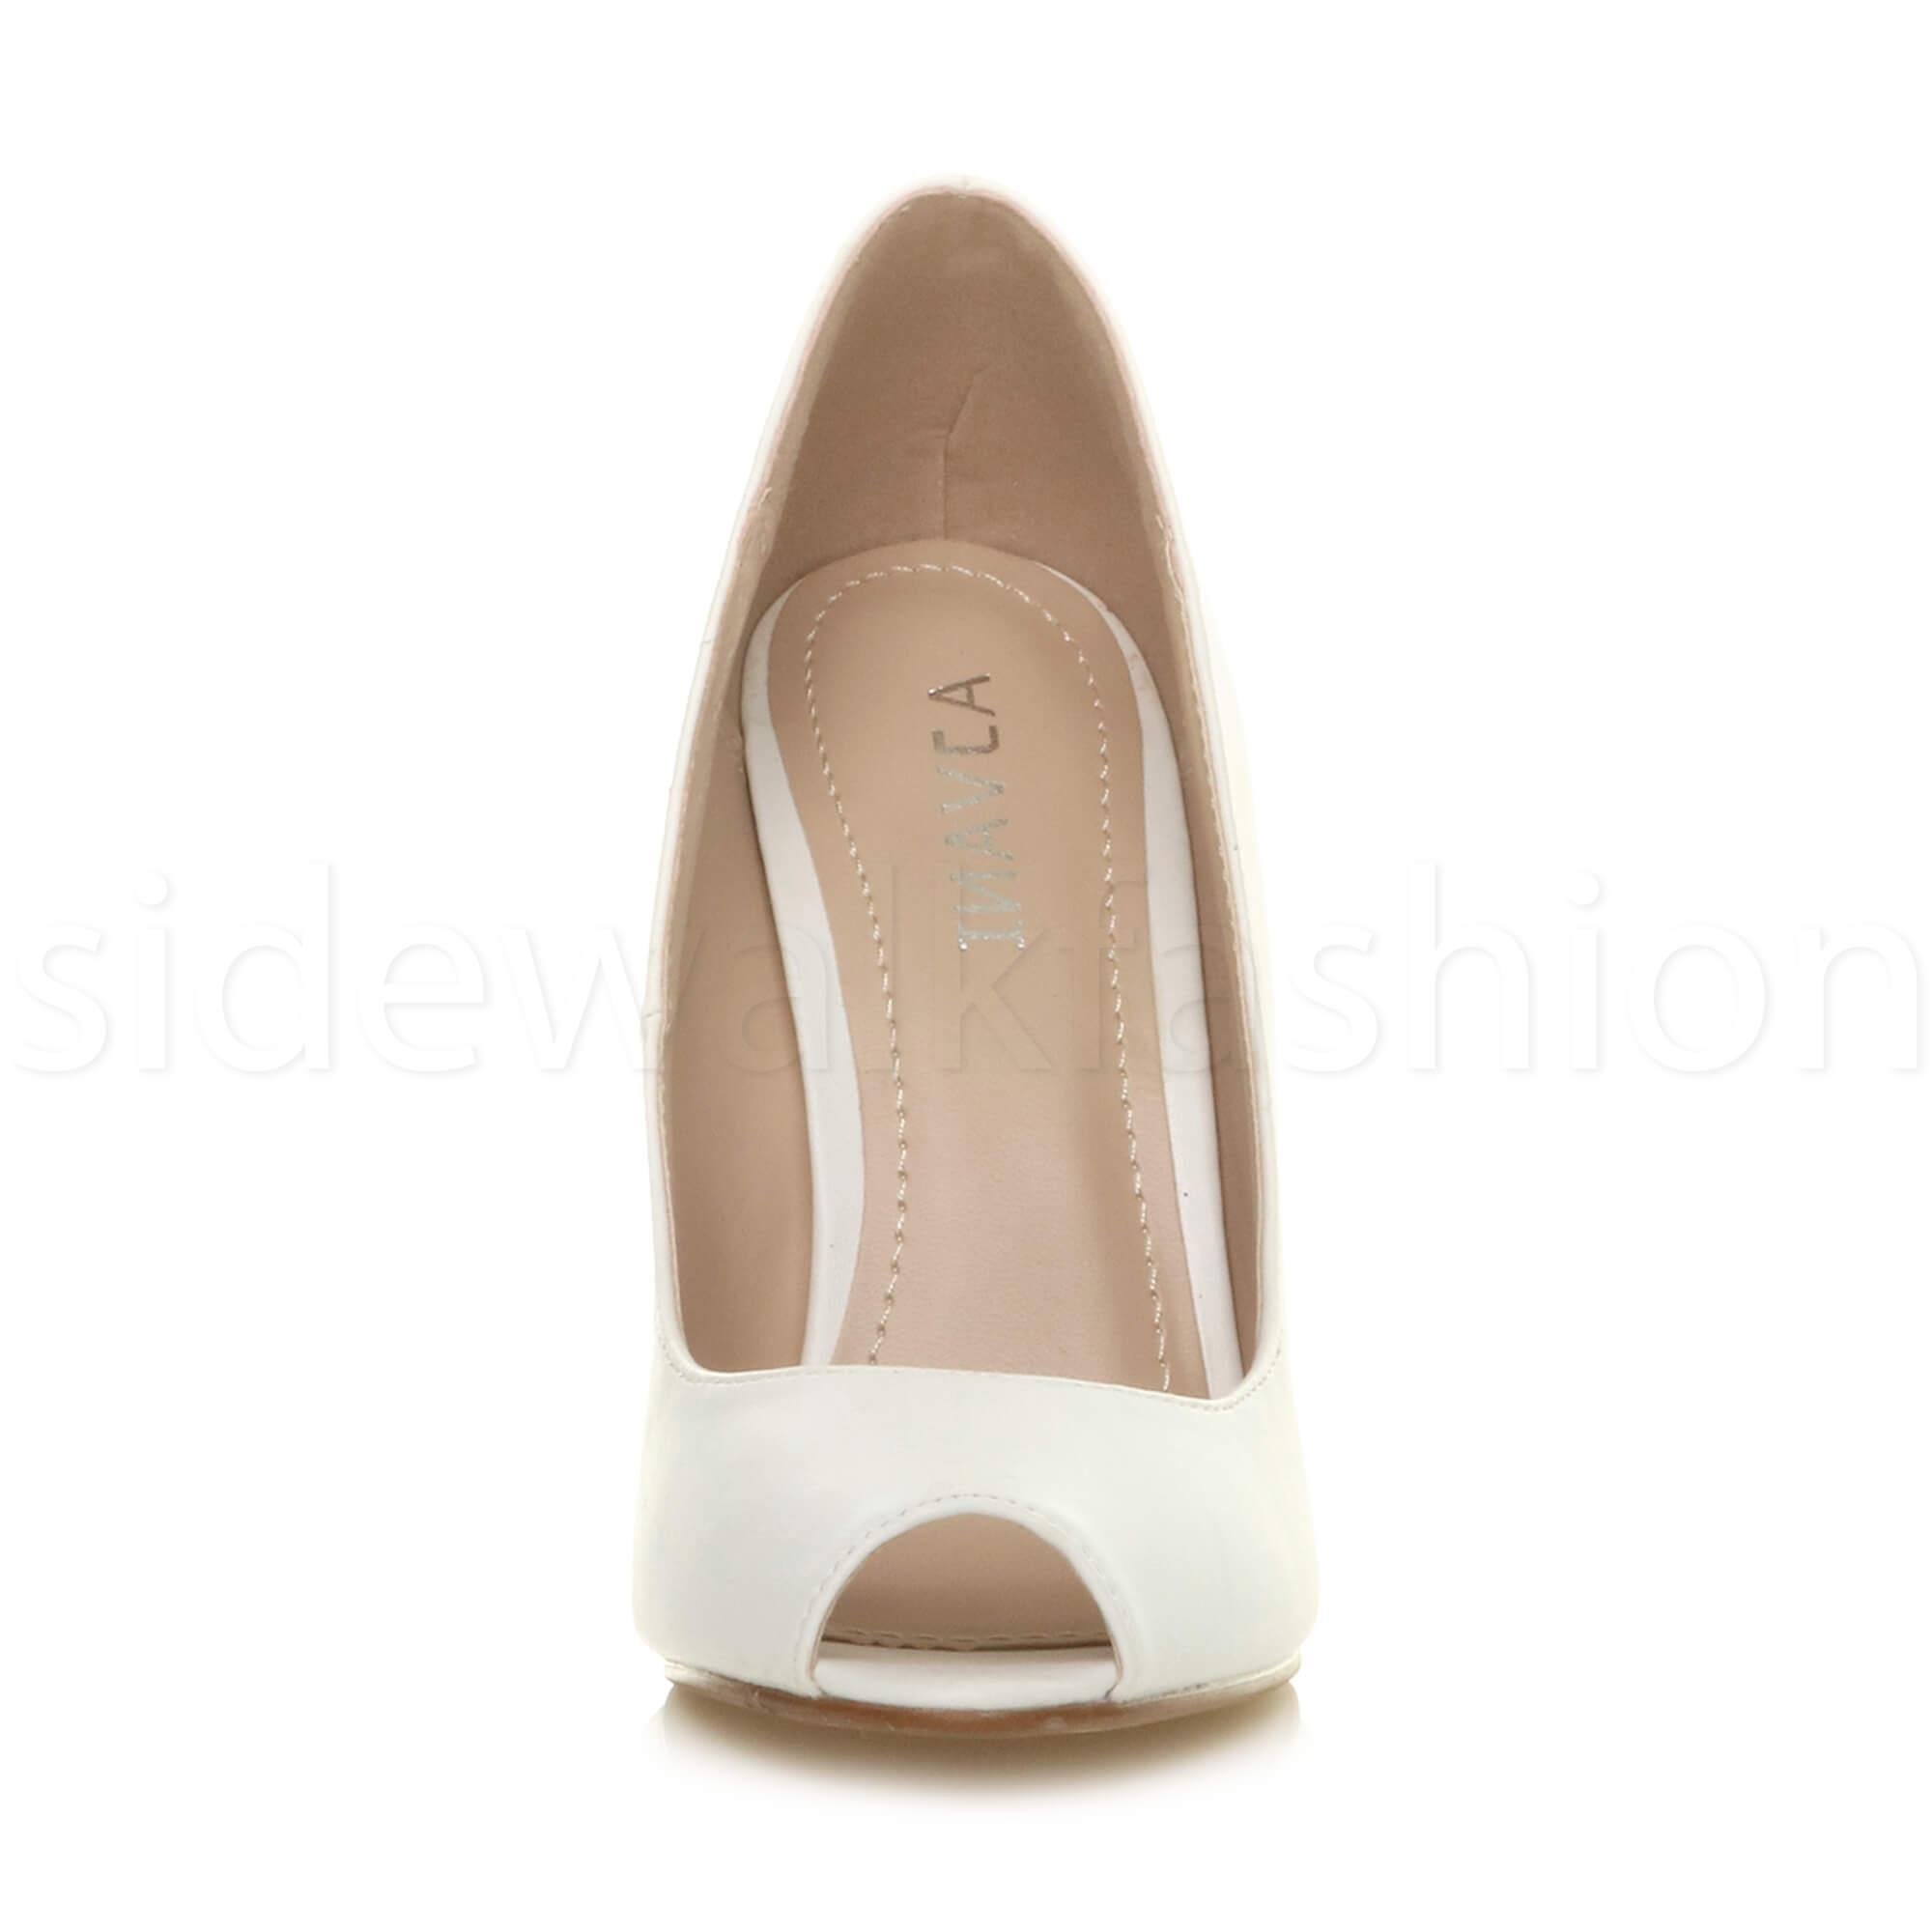 Womens-ladies-high-heel-peep-toe-shoes-court-smart-party-work-sandals-pumps